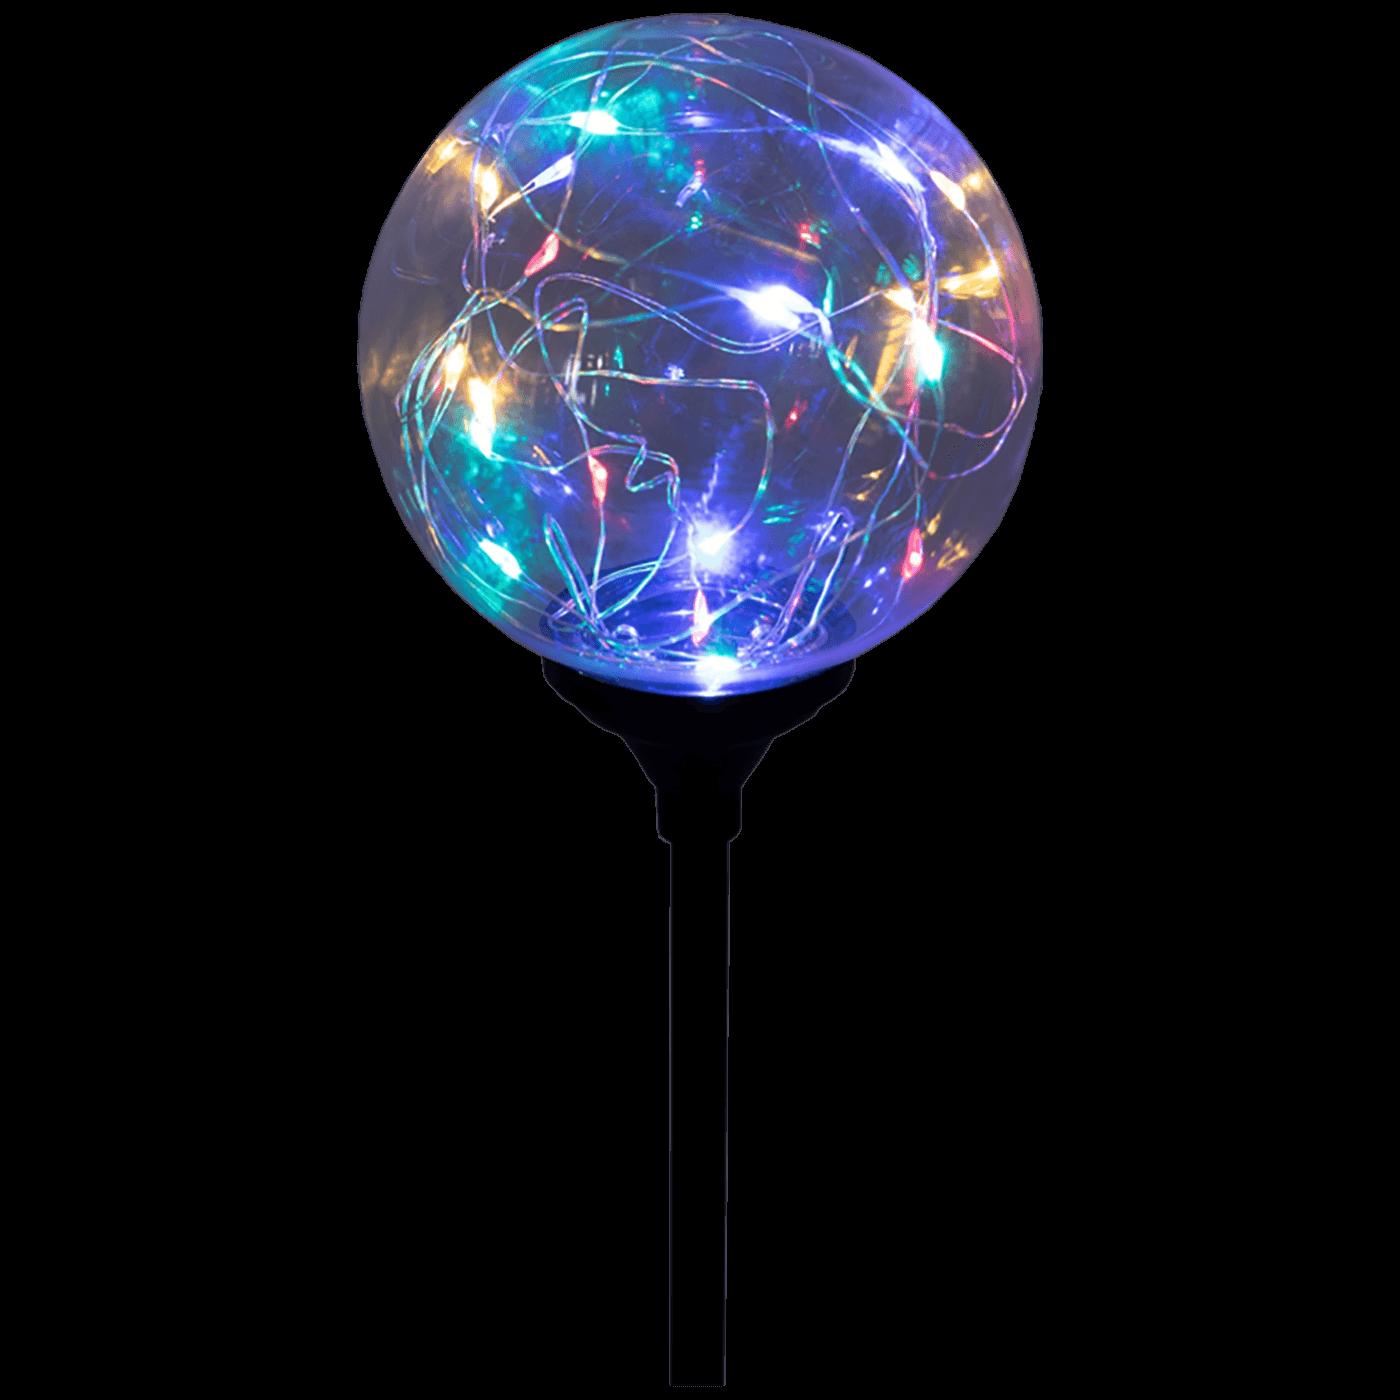 Solarna vrtna LED lampa, staklo/plastika, 600 mAh